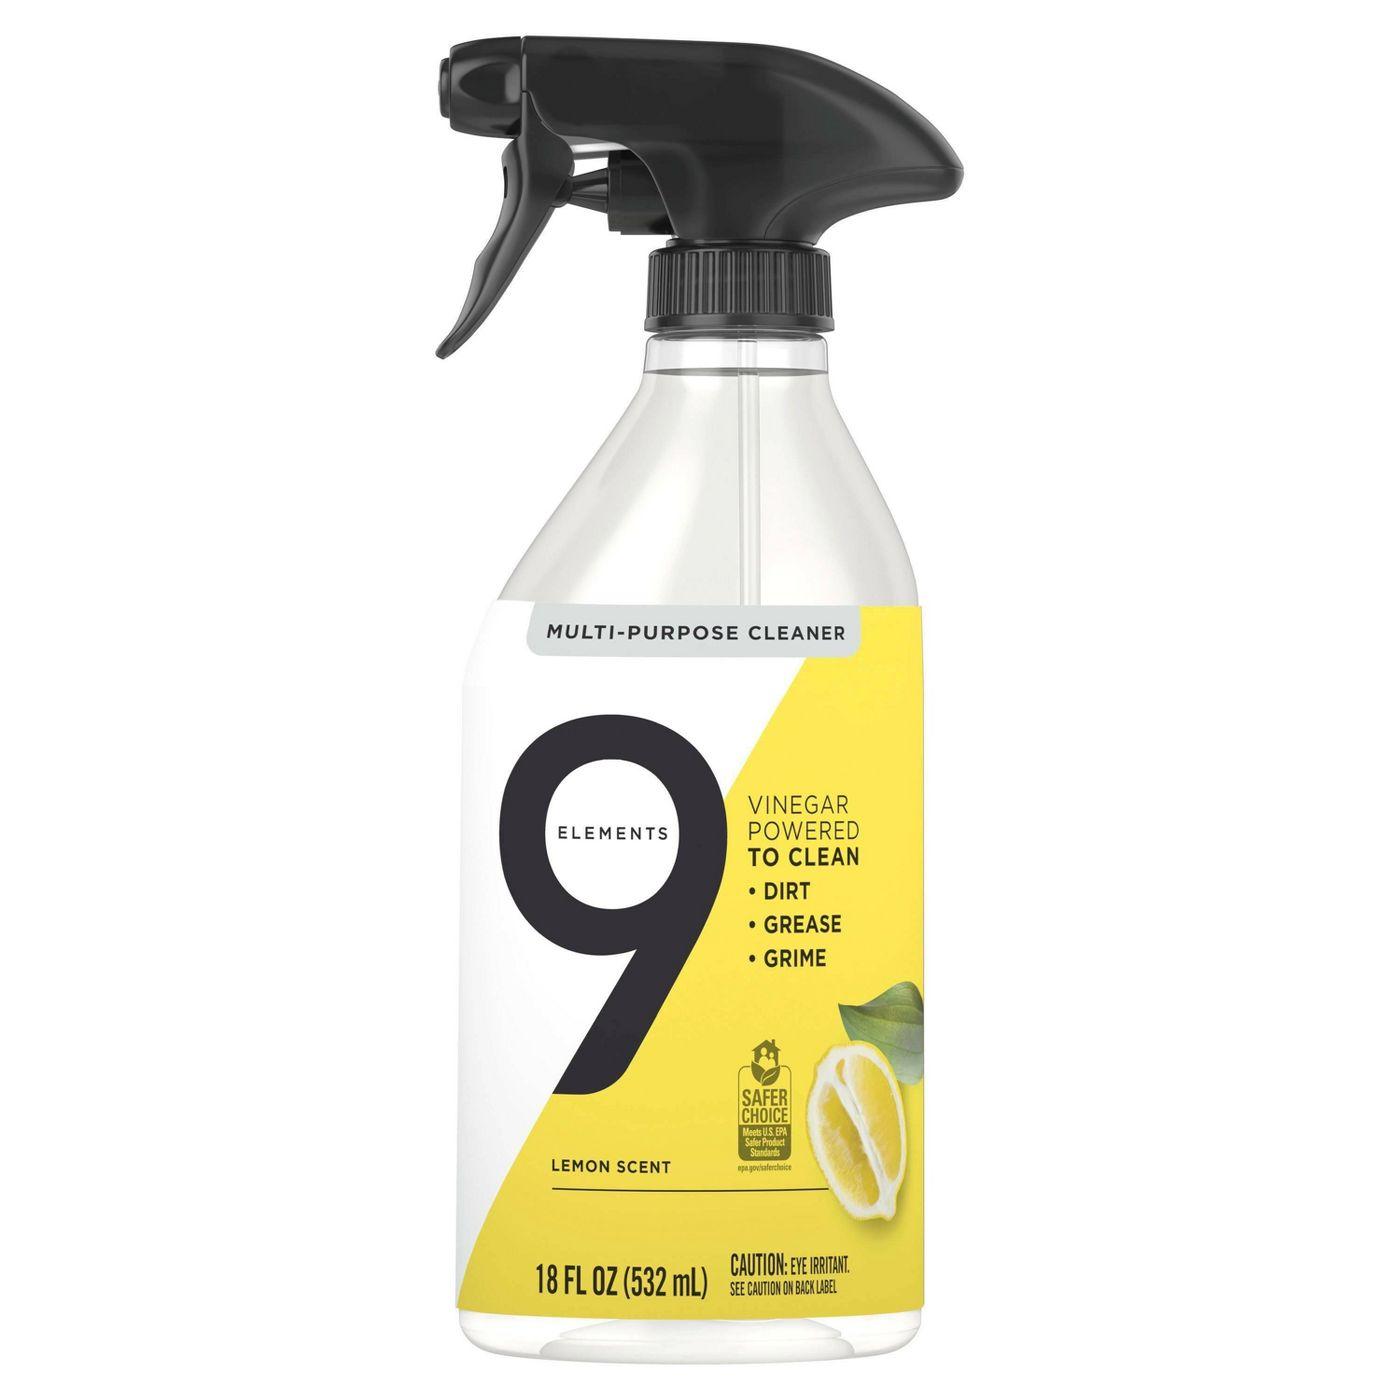 9 Elements Bathroom Cleaner, Lemon Scent